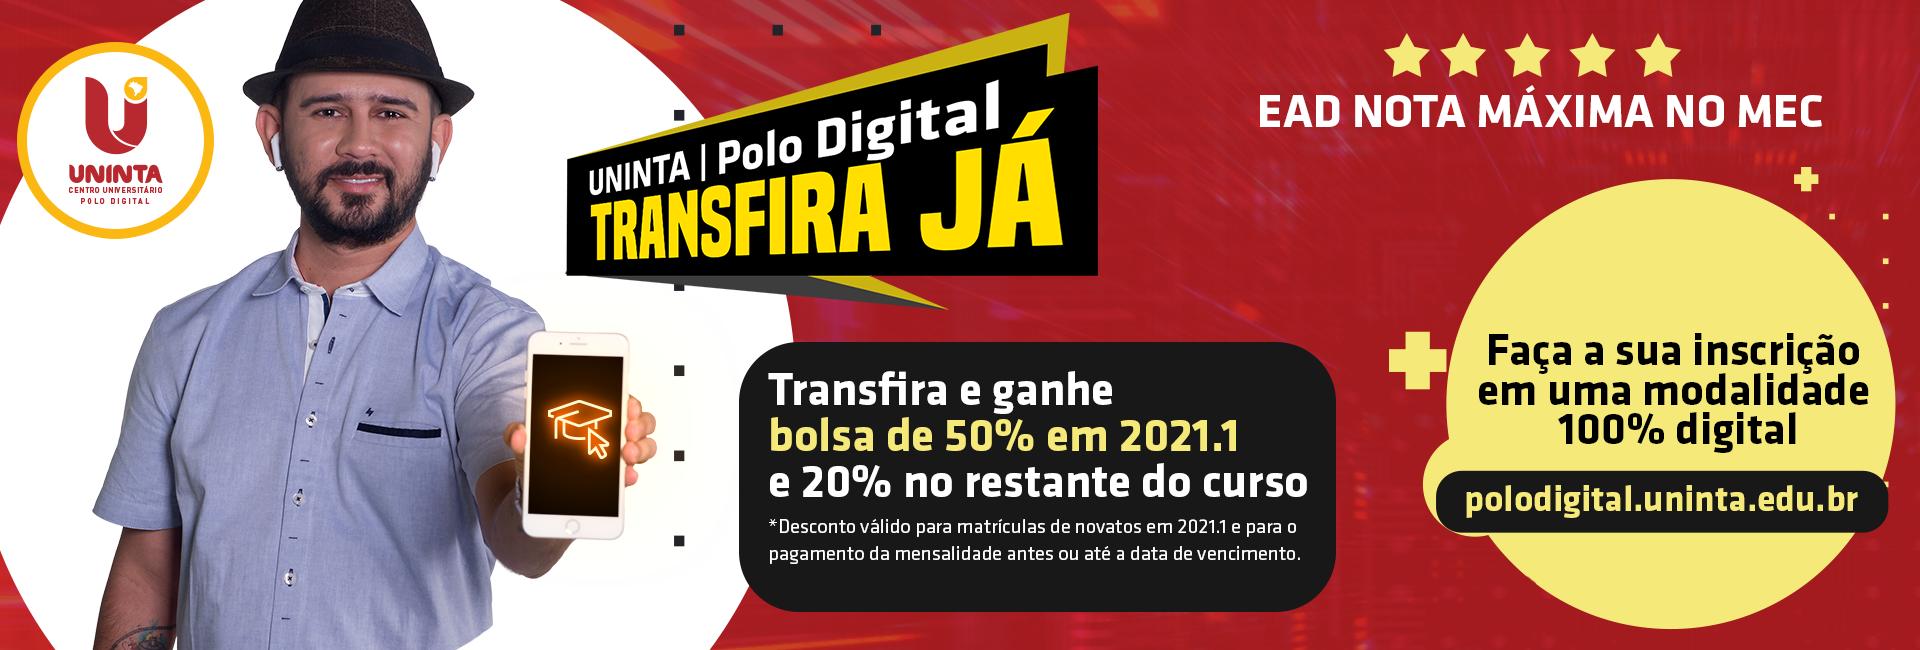 POLO DIGITAL - Banner Transfira já - 1920x650